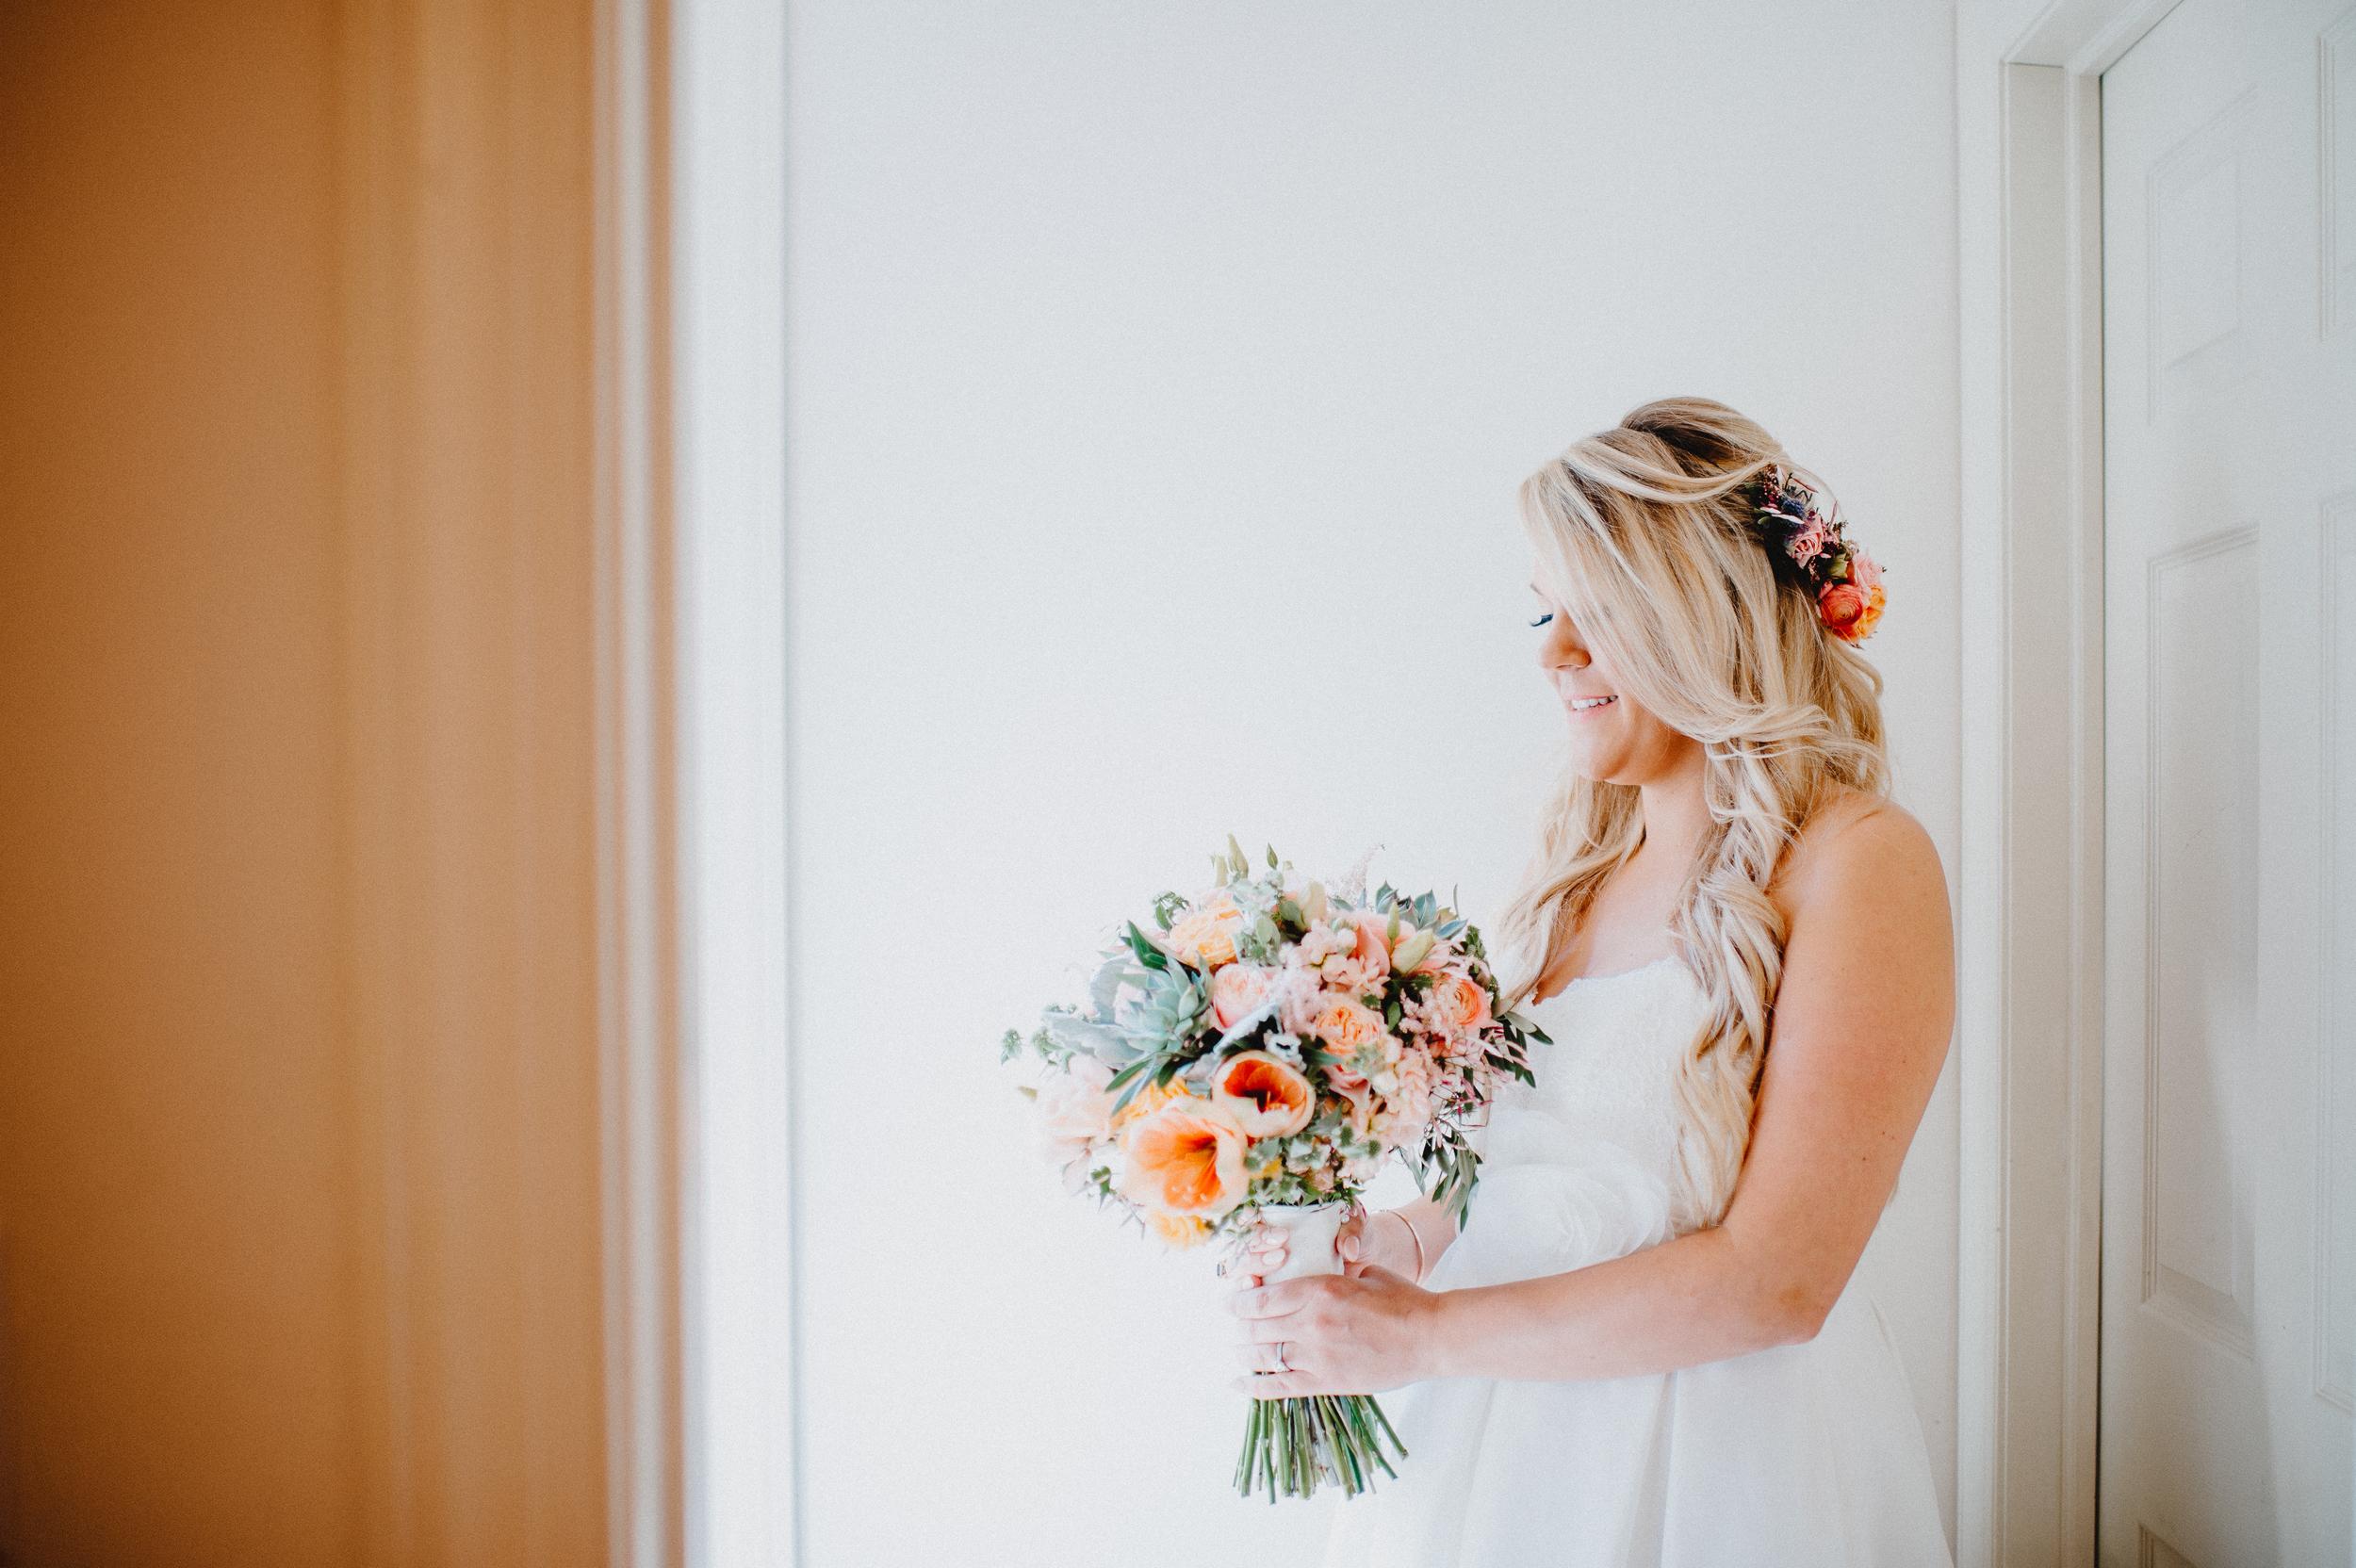 holly-hedge-estate-wedding-photographer-pat-robinson-photography-20.jpg